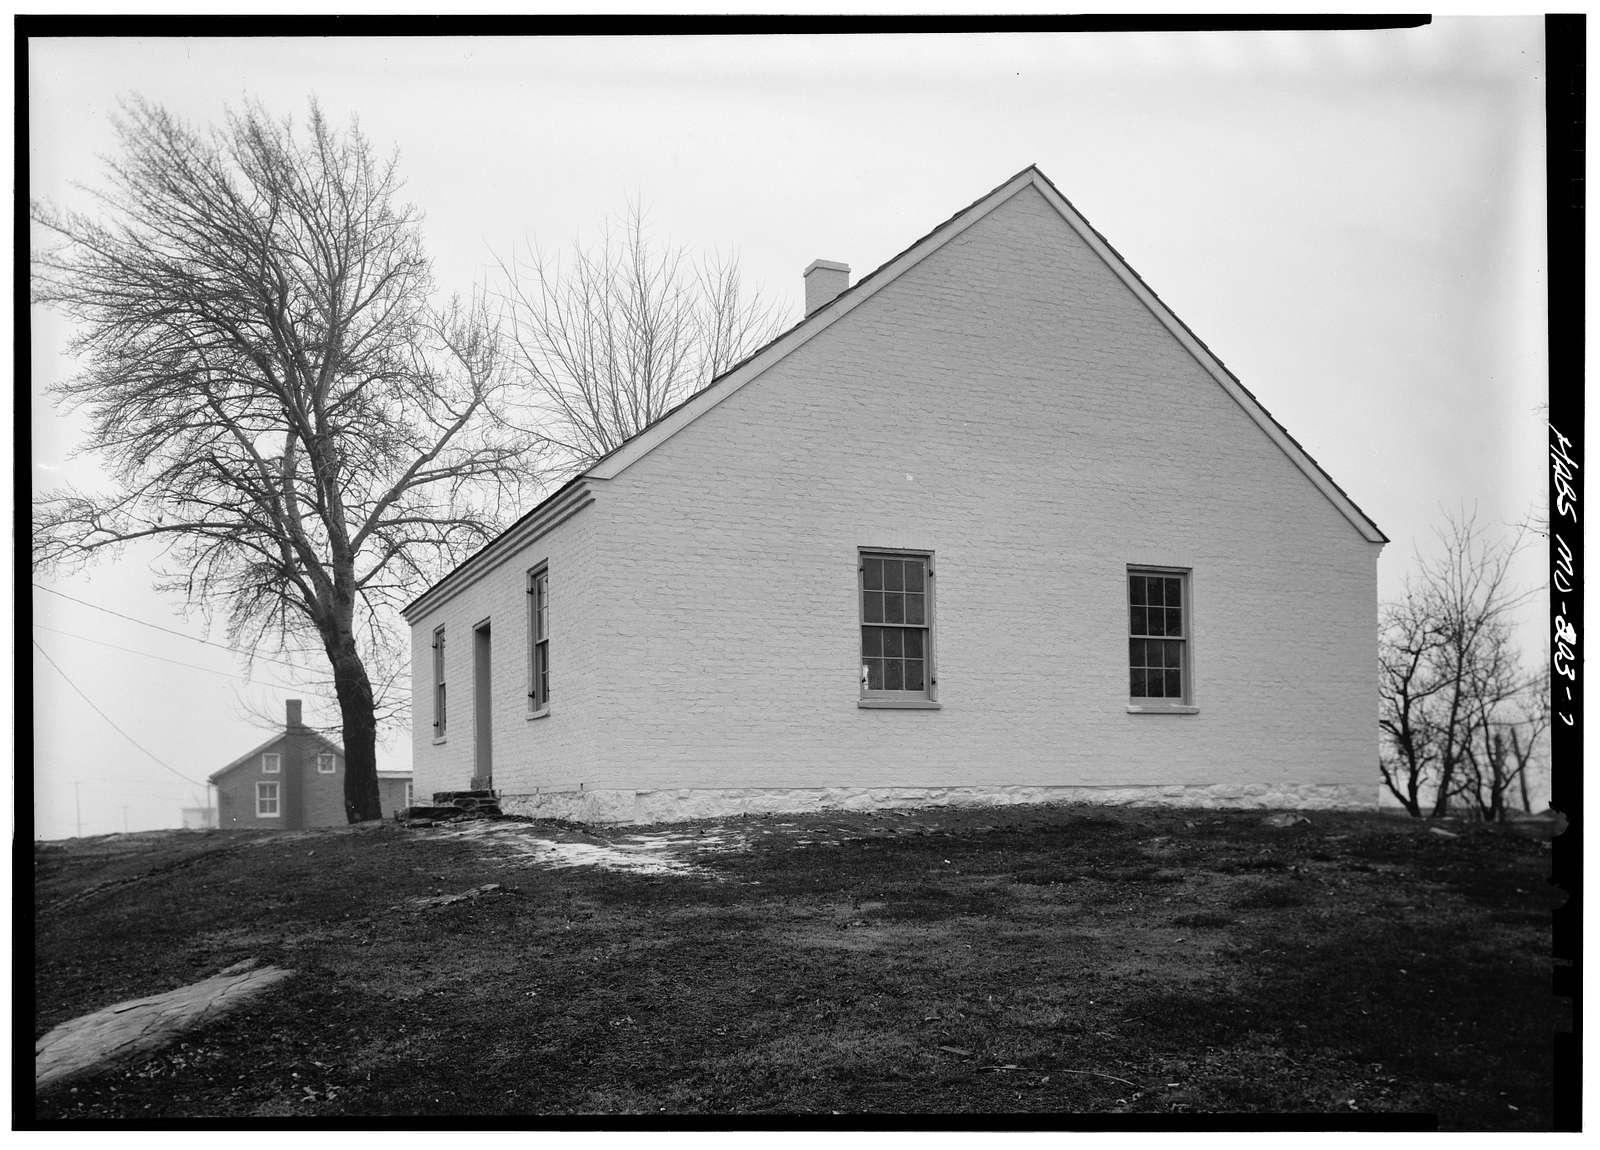 Dunker Church, Hagerstown & Smoketown Roads, Sharpsburg, Washington County, MD